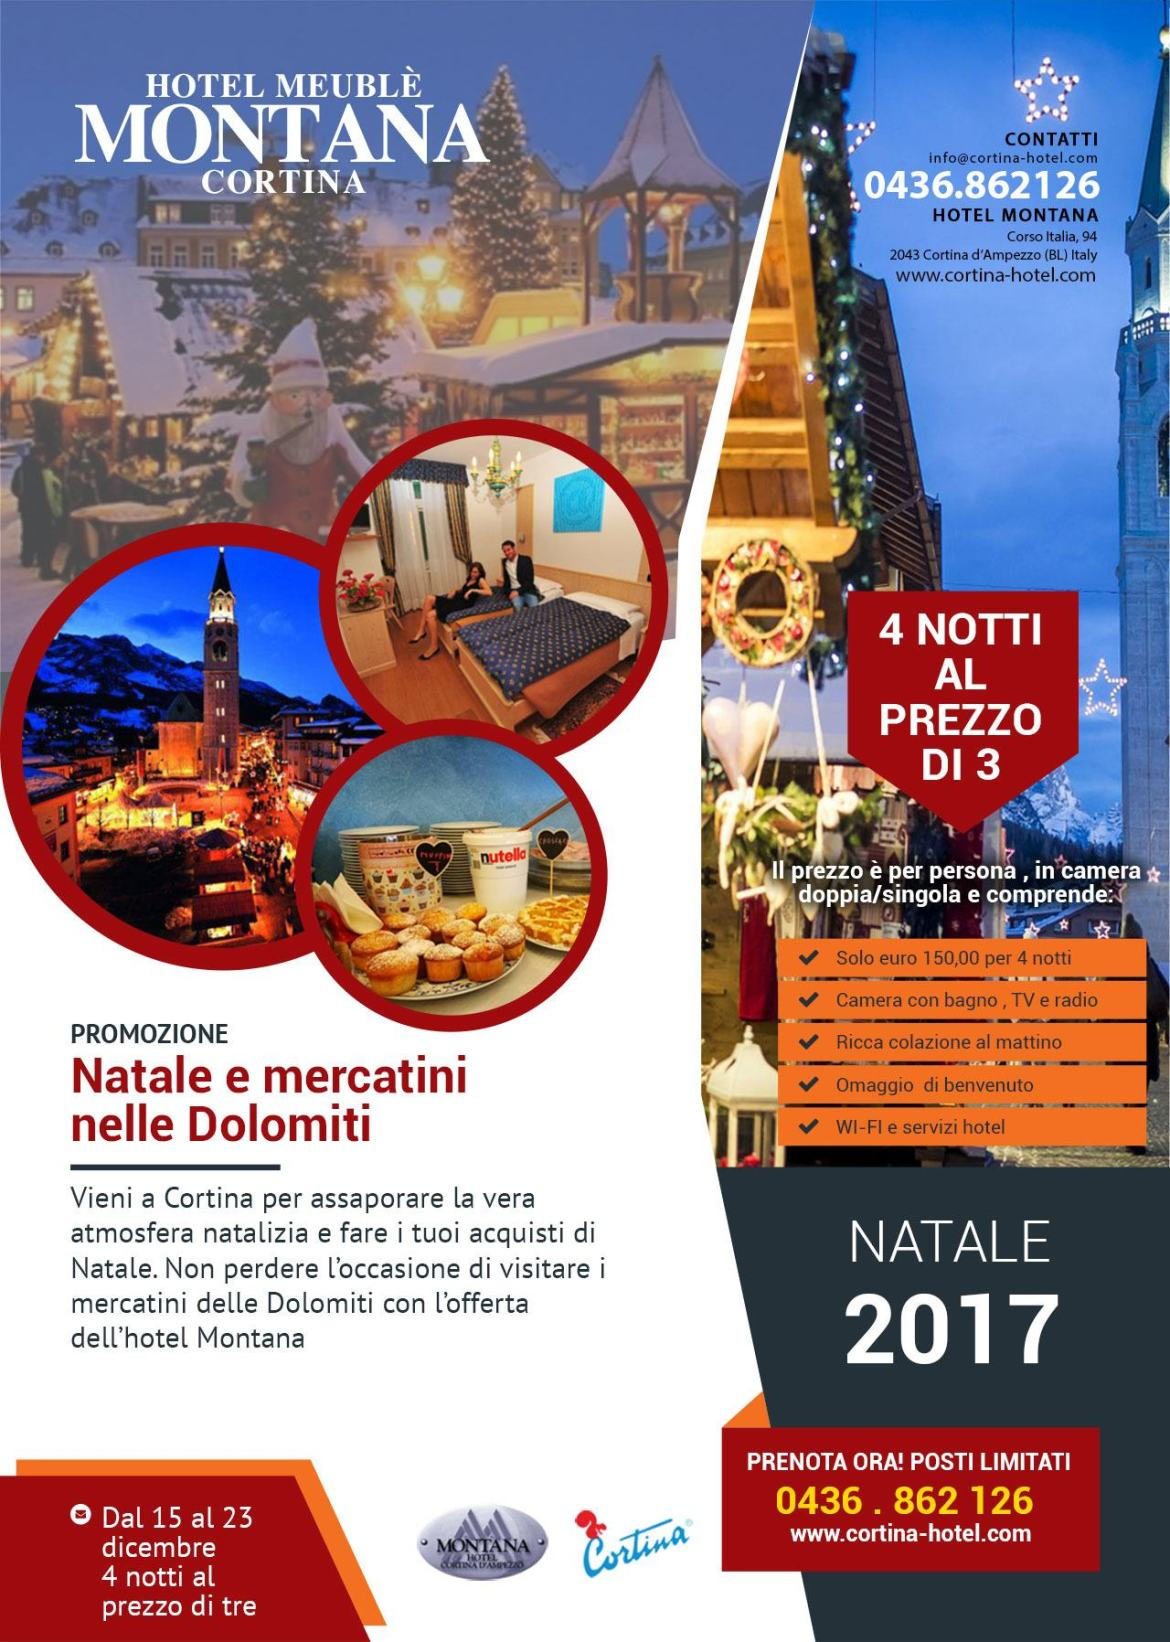 mercatini natale dolomiti offerta hotel Promozione Natale 2017 e mercatini nelle Dolomiti